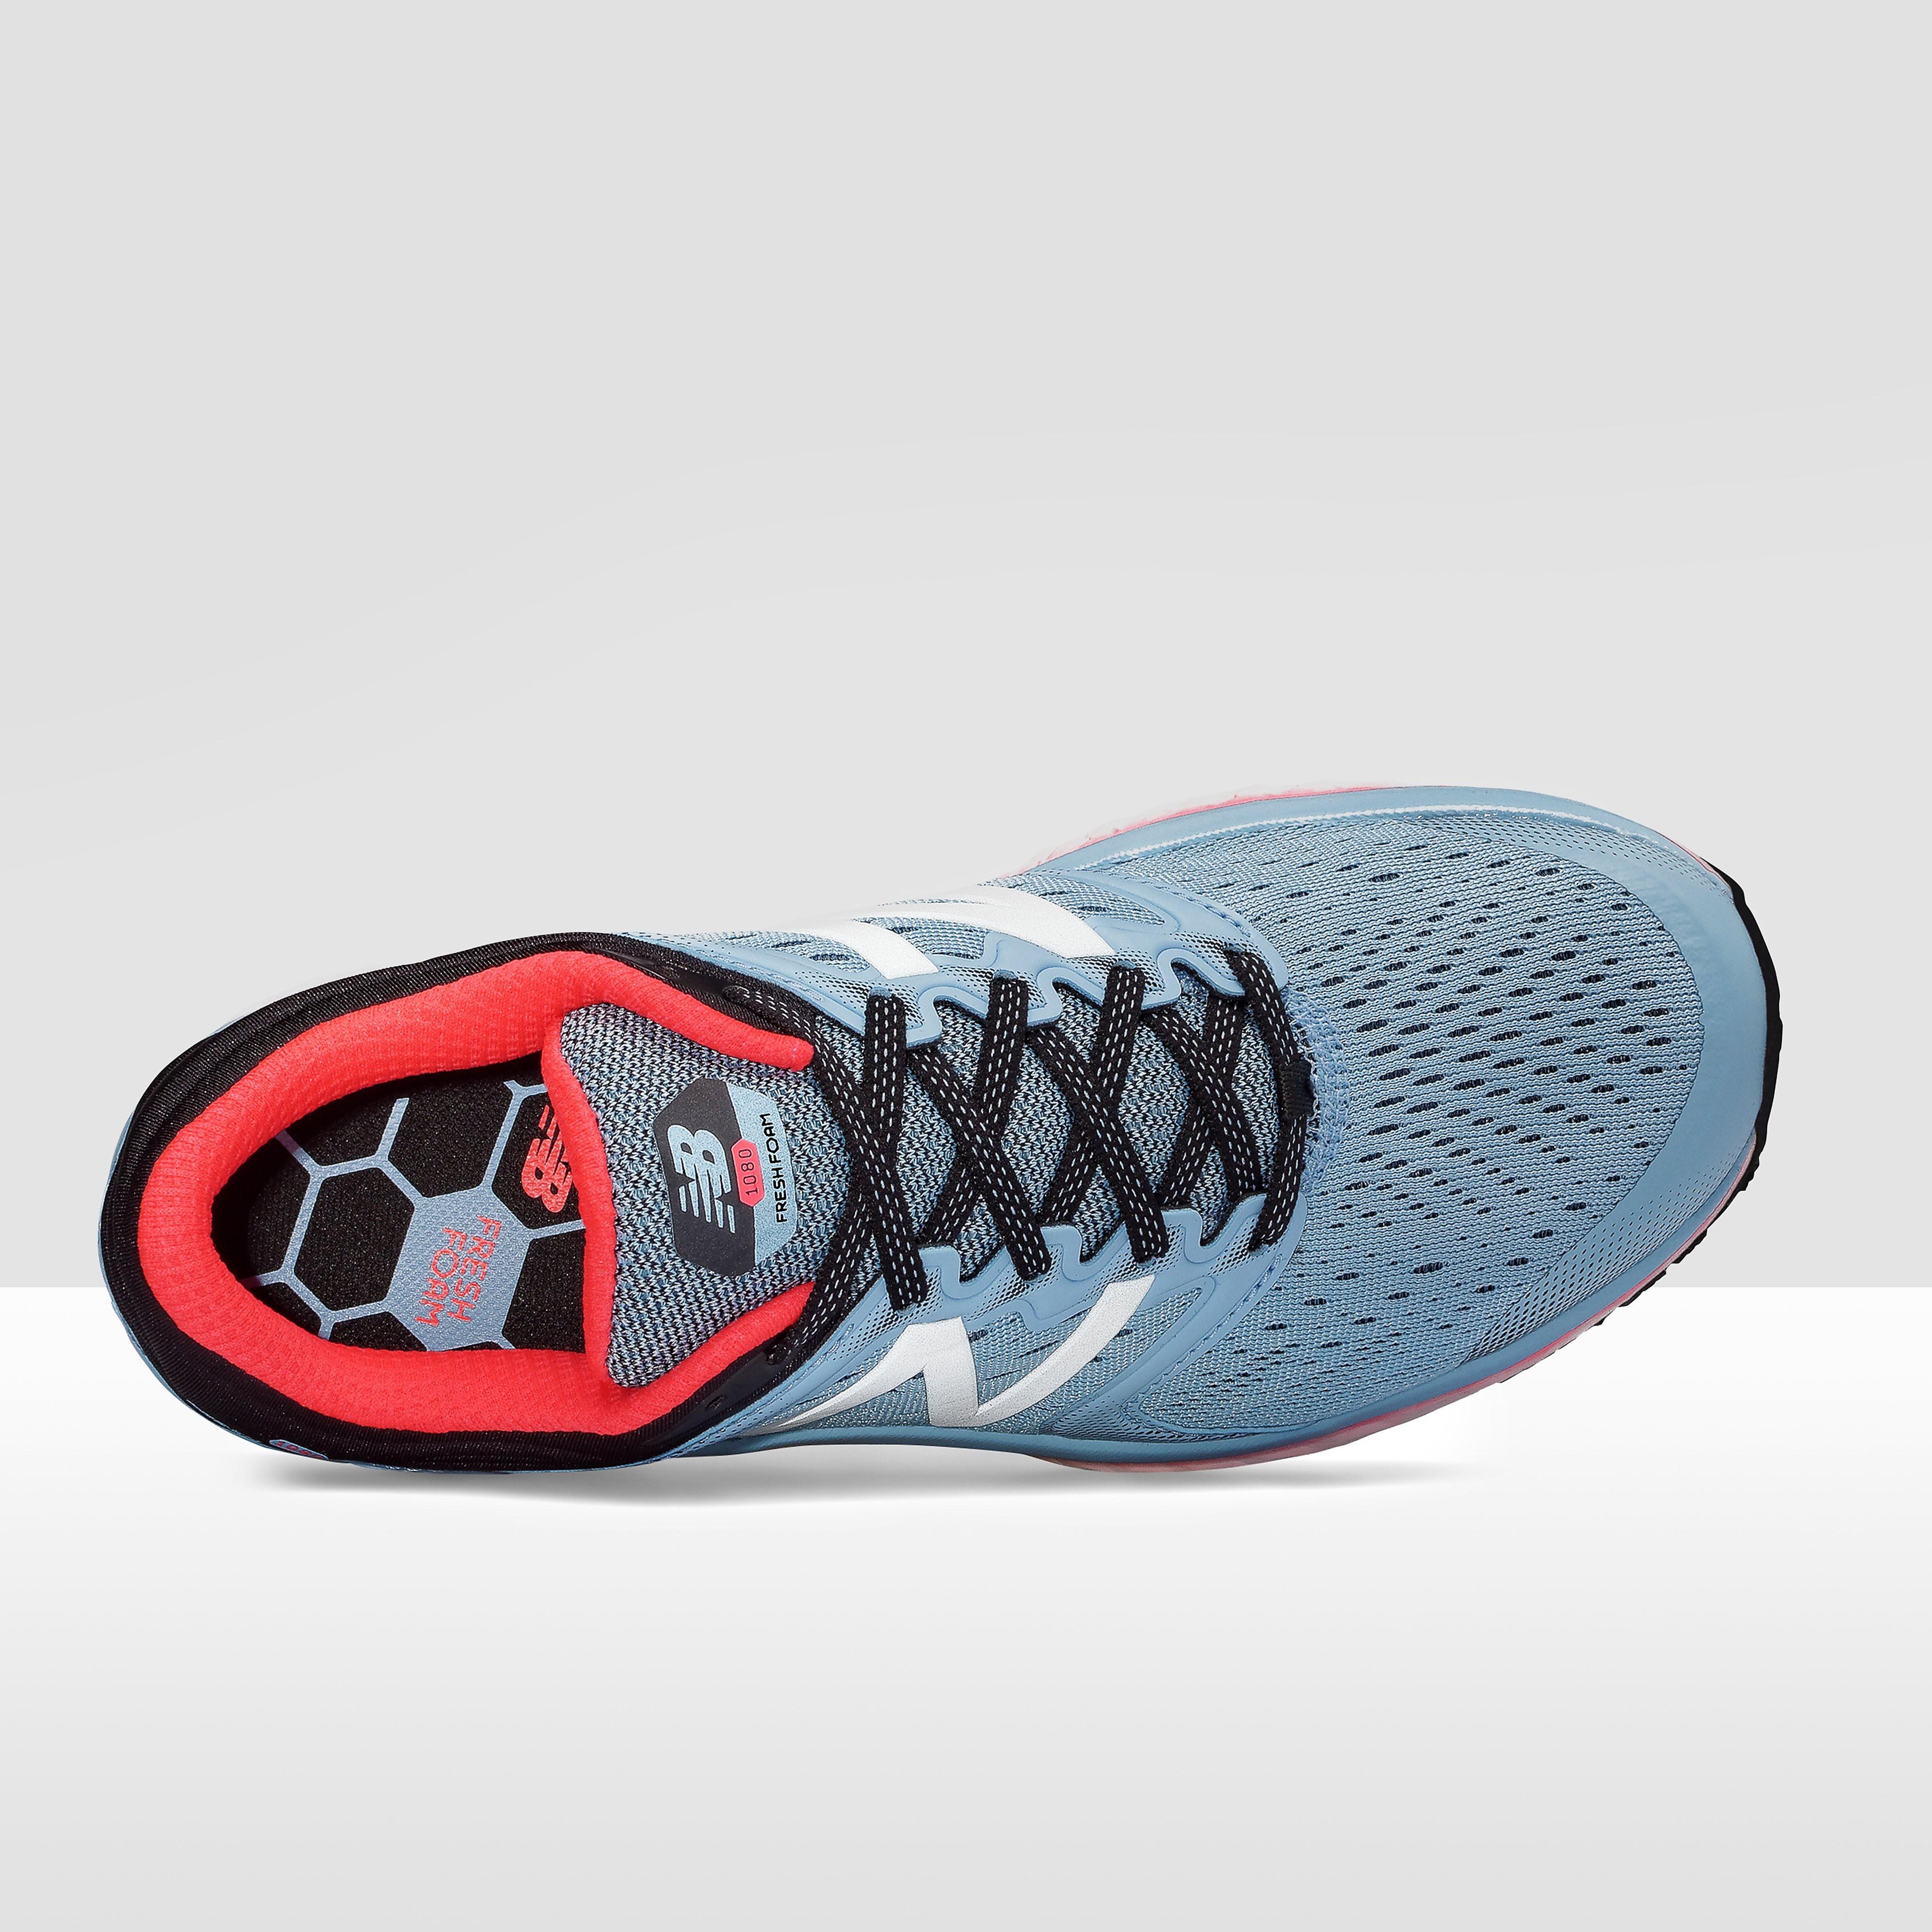 New Balance Fresh Foam 1080v8 Women's Running Shoes